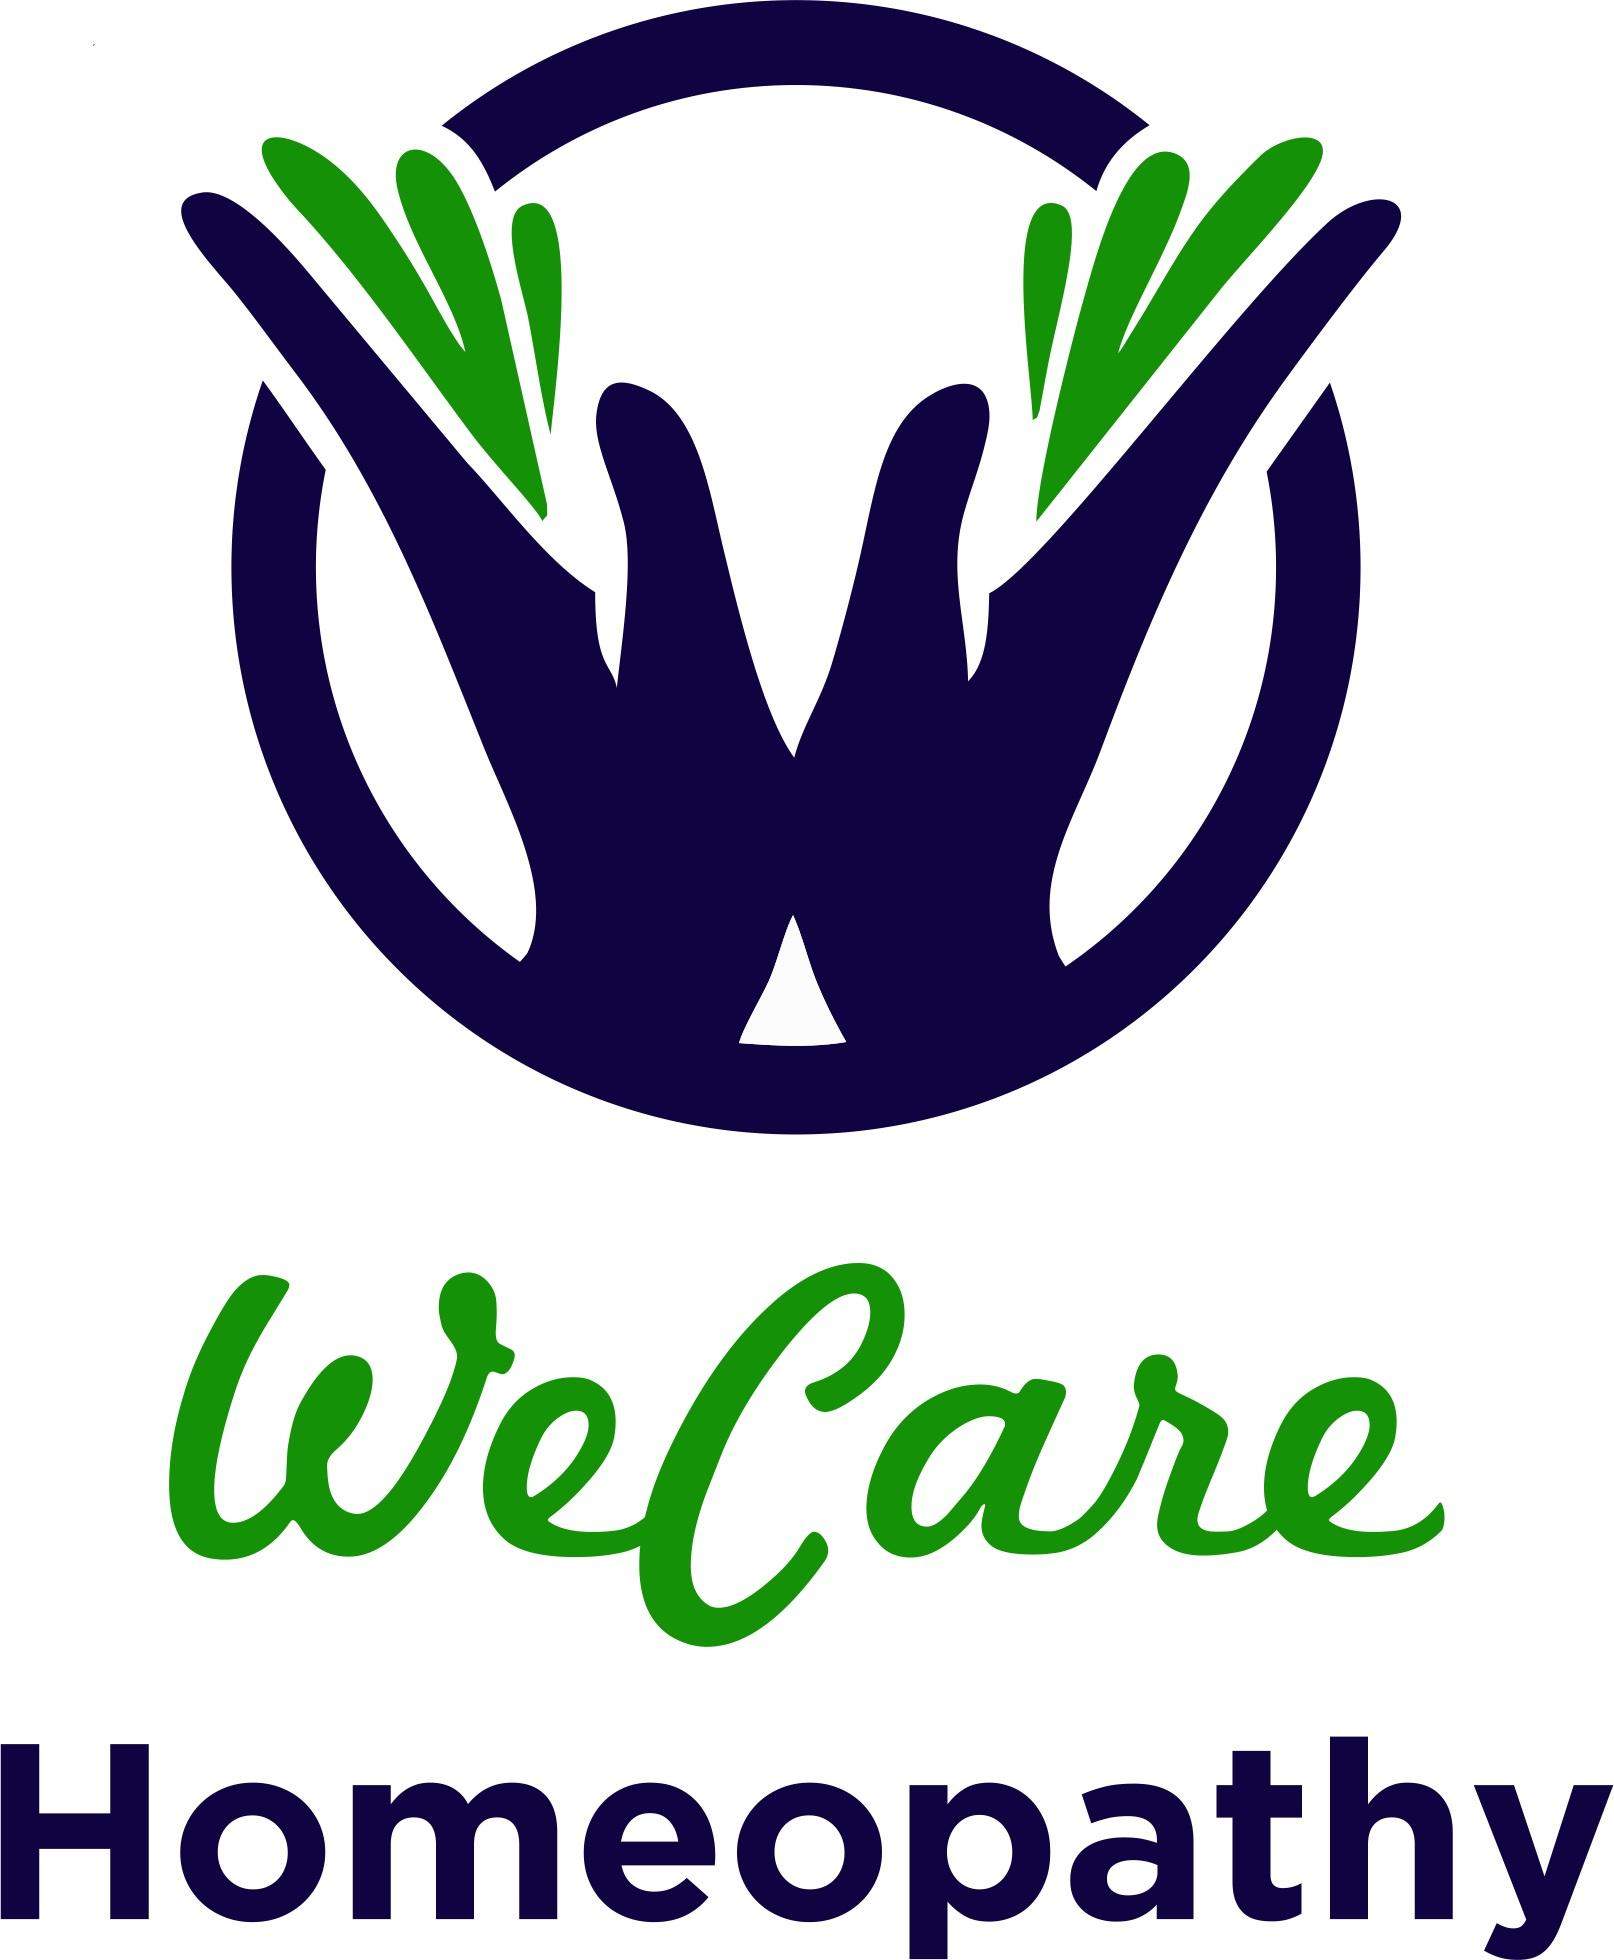 Wecare Homeopathy